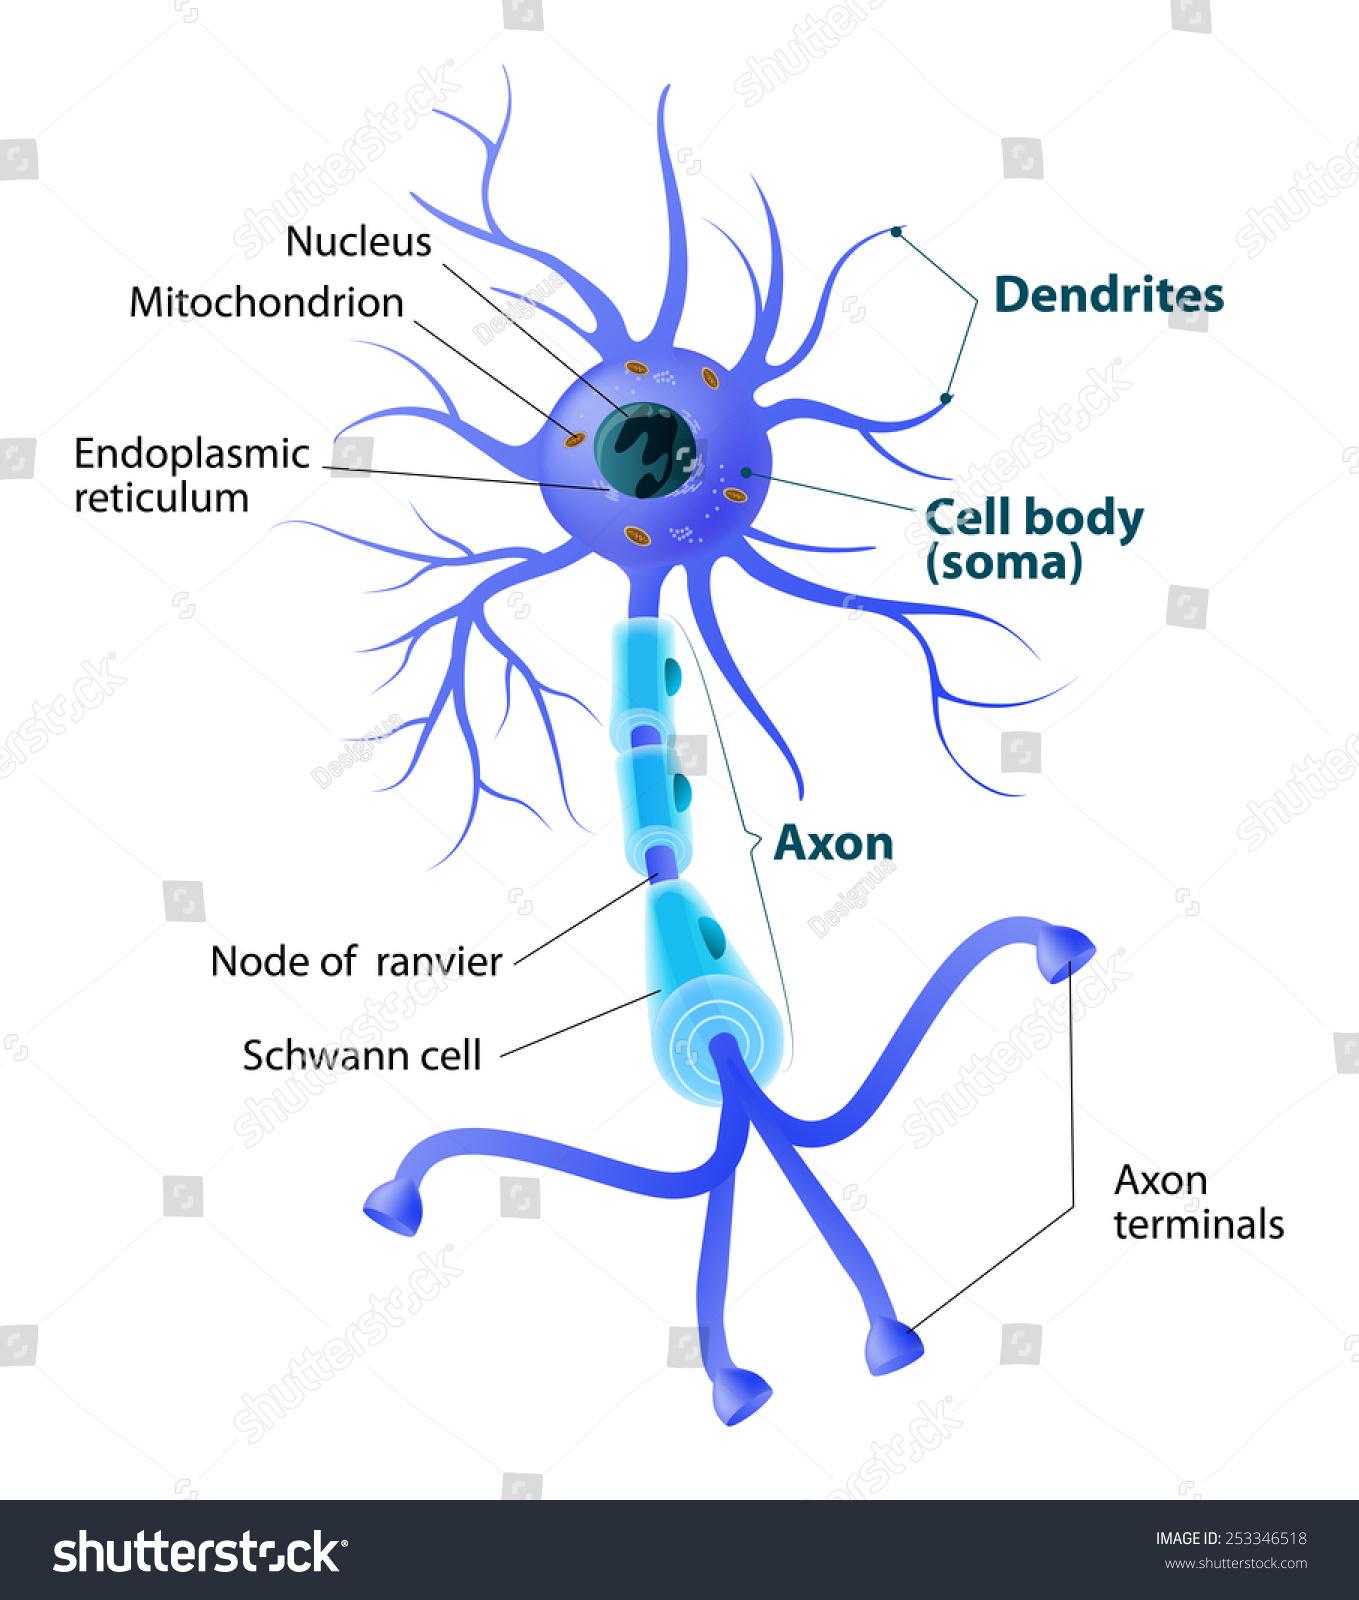 Anatomy Typical Human Neuron Structure Neuron Stockillustration ...